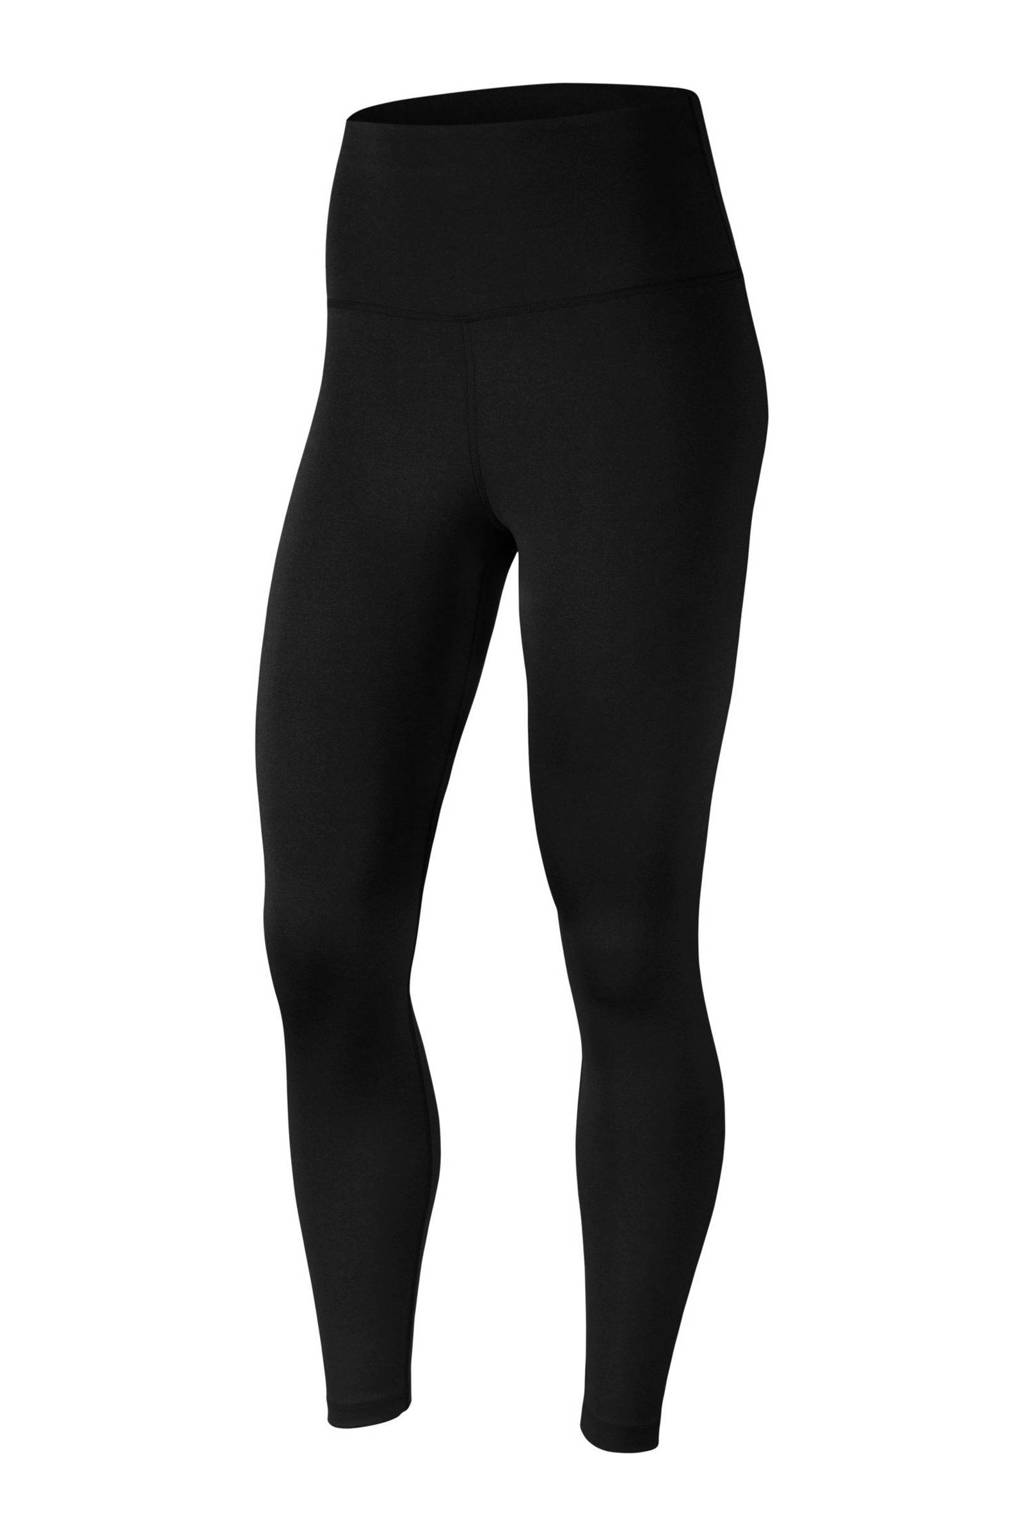 Nike 7/8 sportlegging zwart, Zwart/donkergrijs